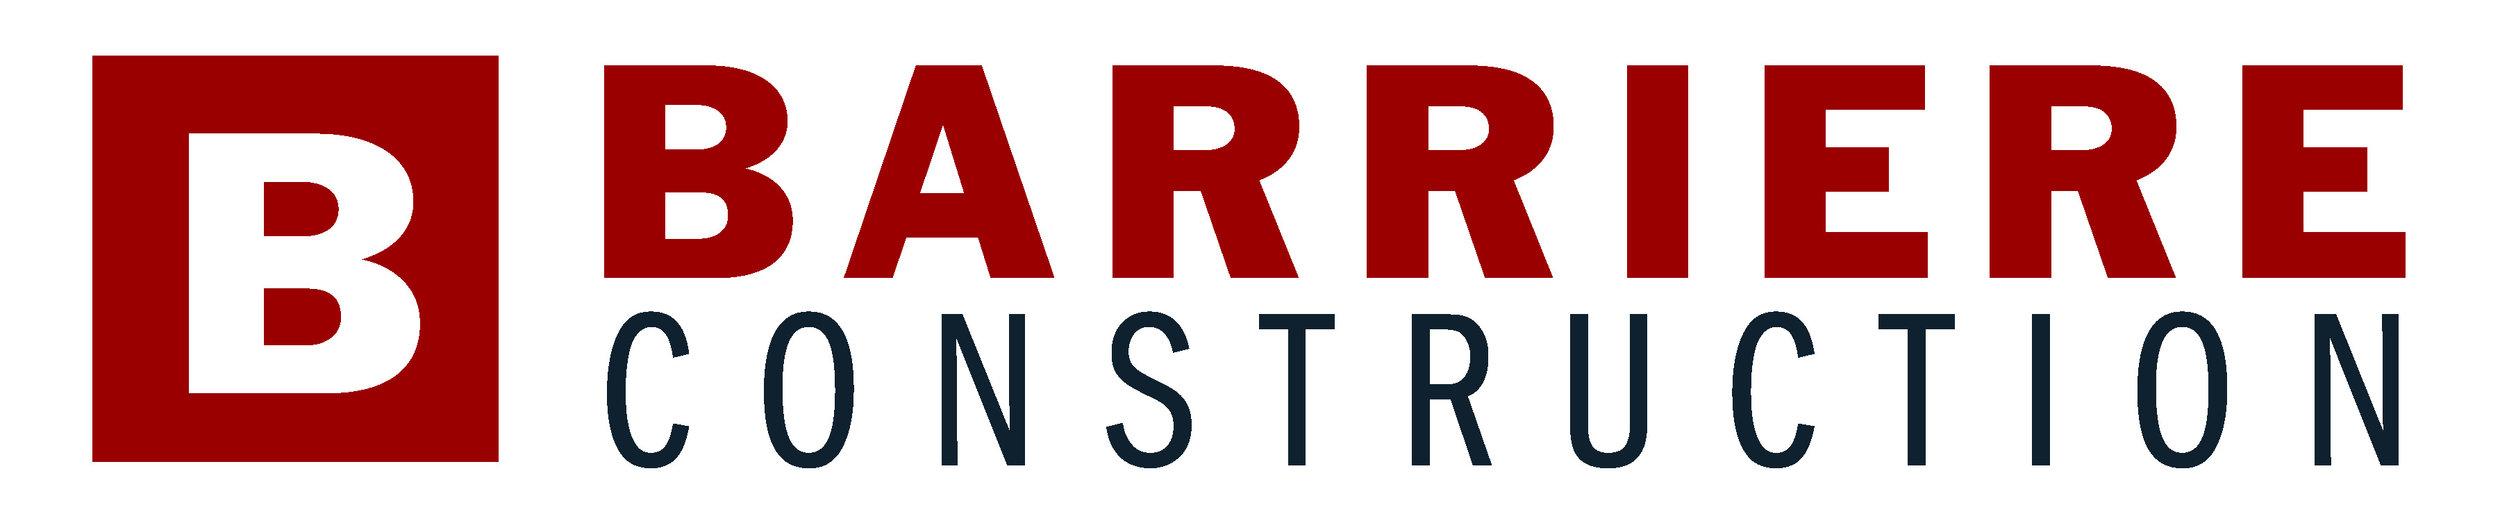 Barriere Construction Logo